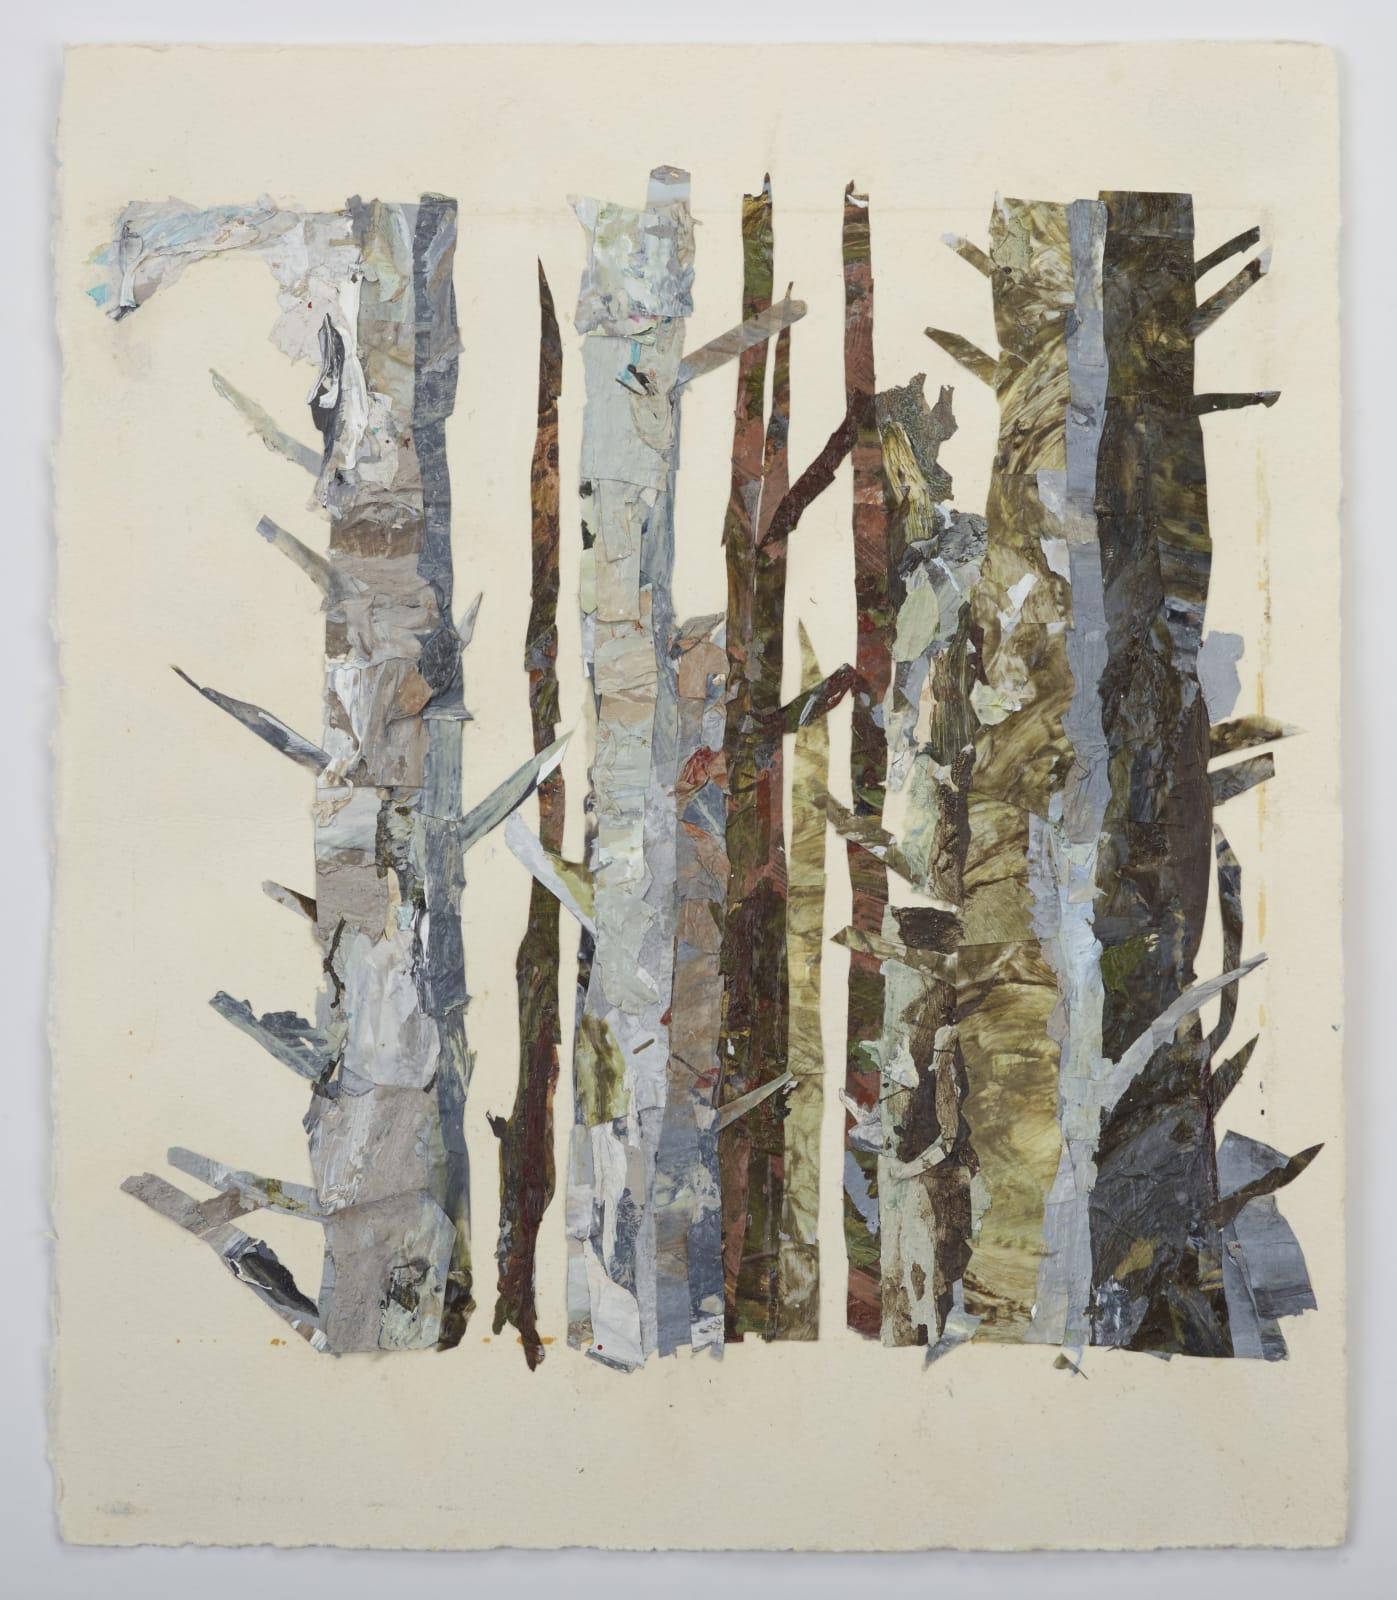 Samantha Bates, Remnants